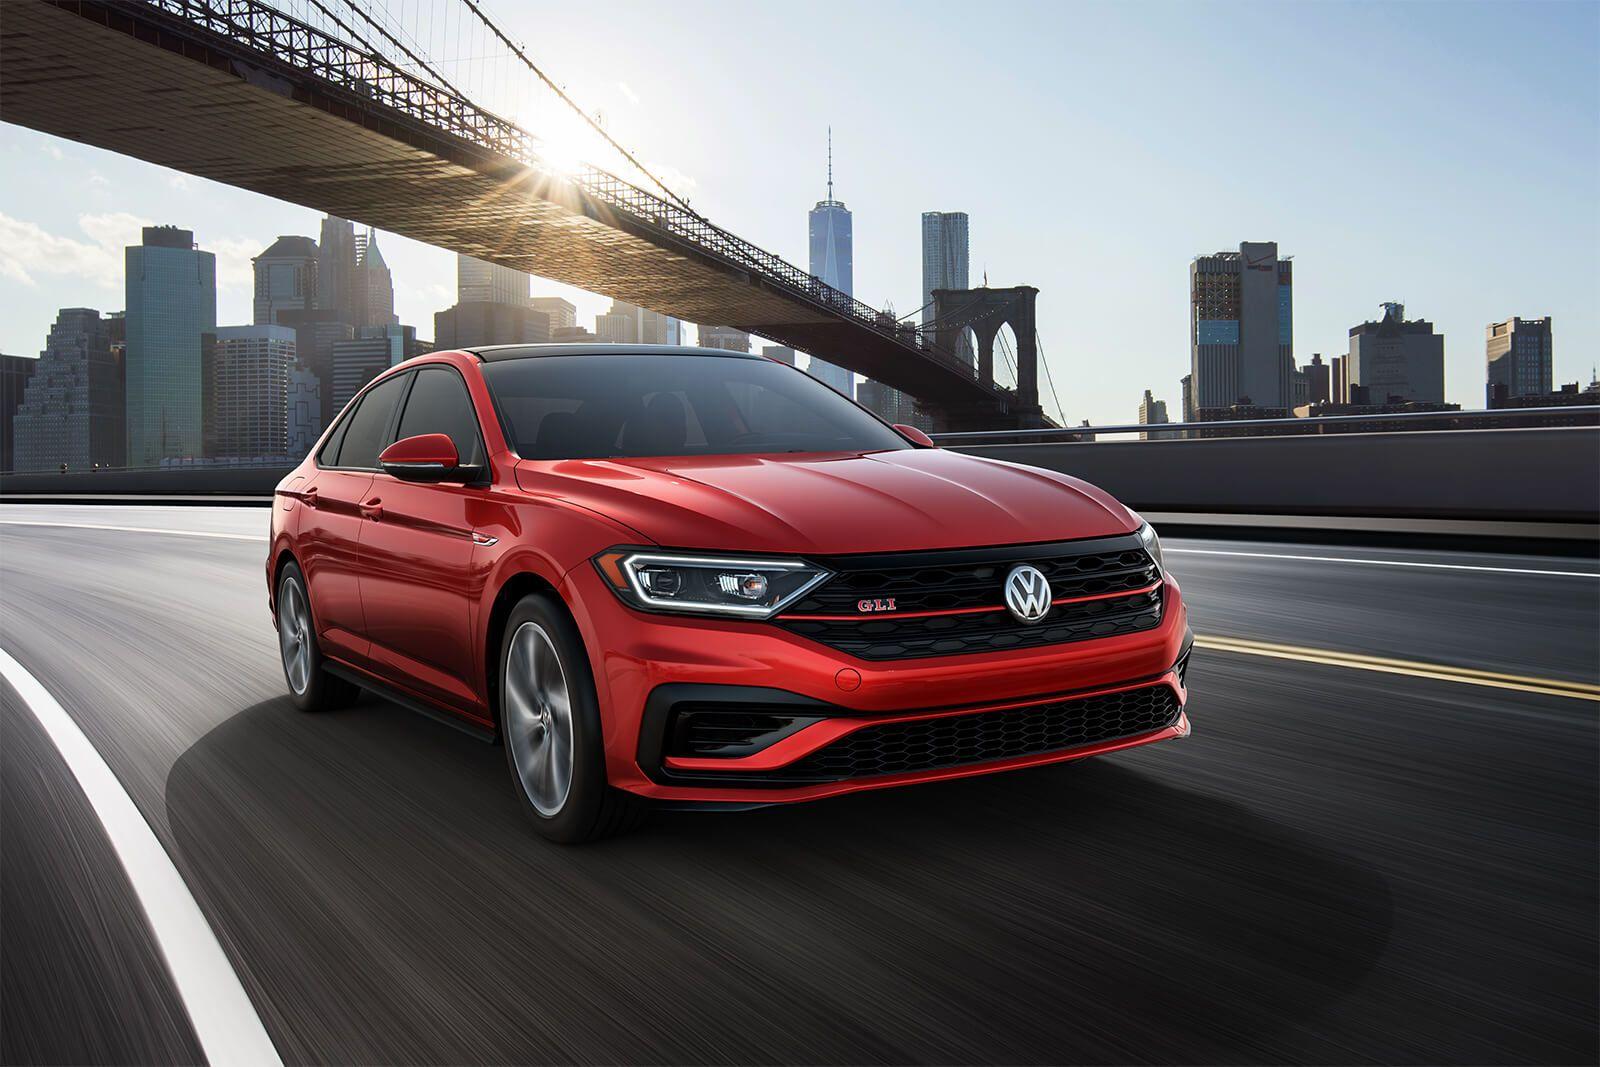 2020 Volkswagen Jetta Research New